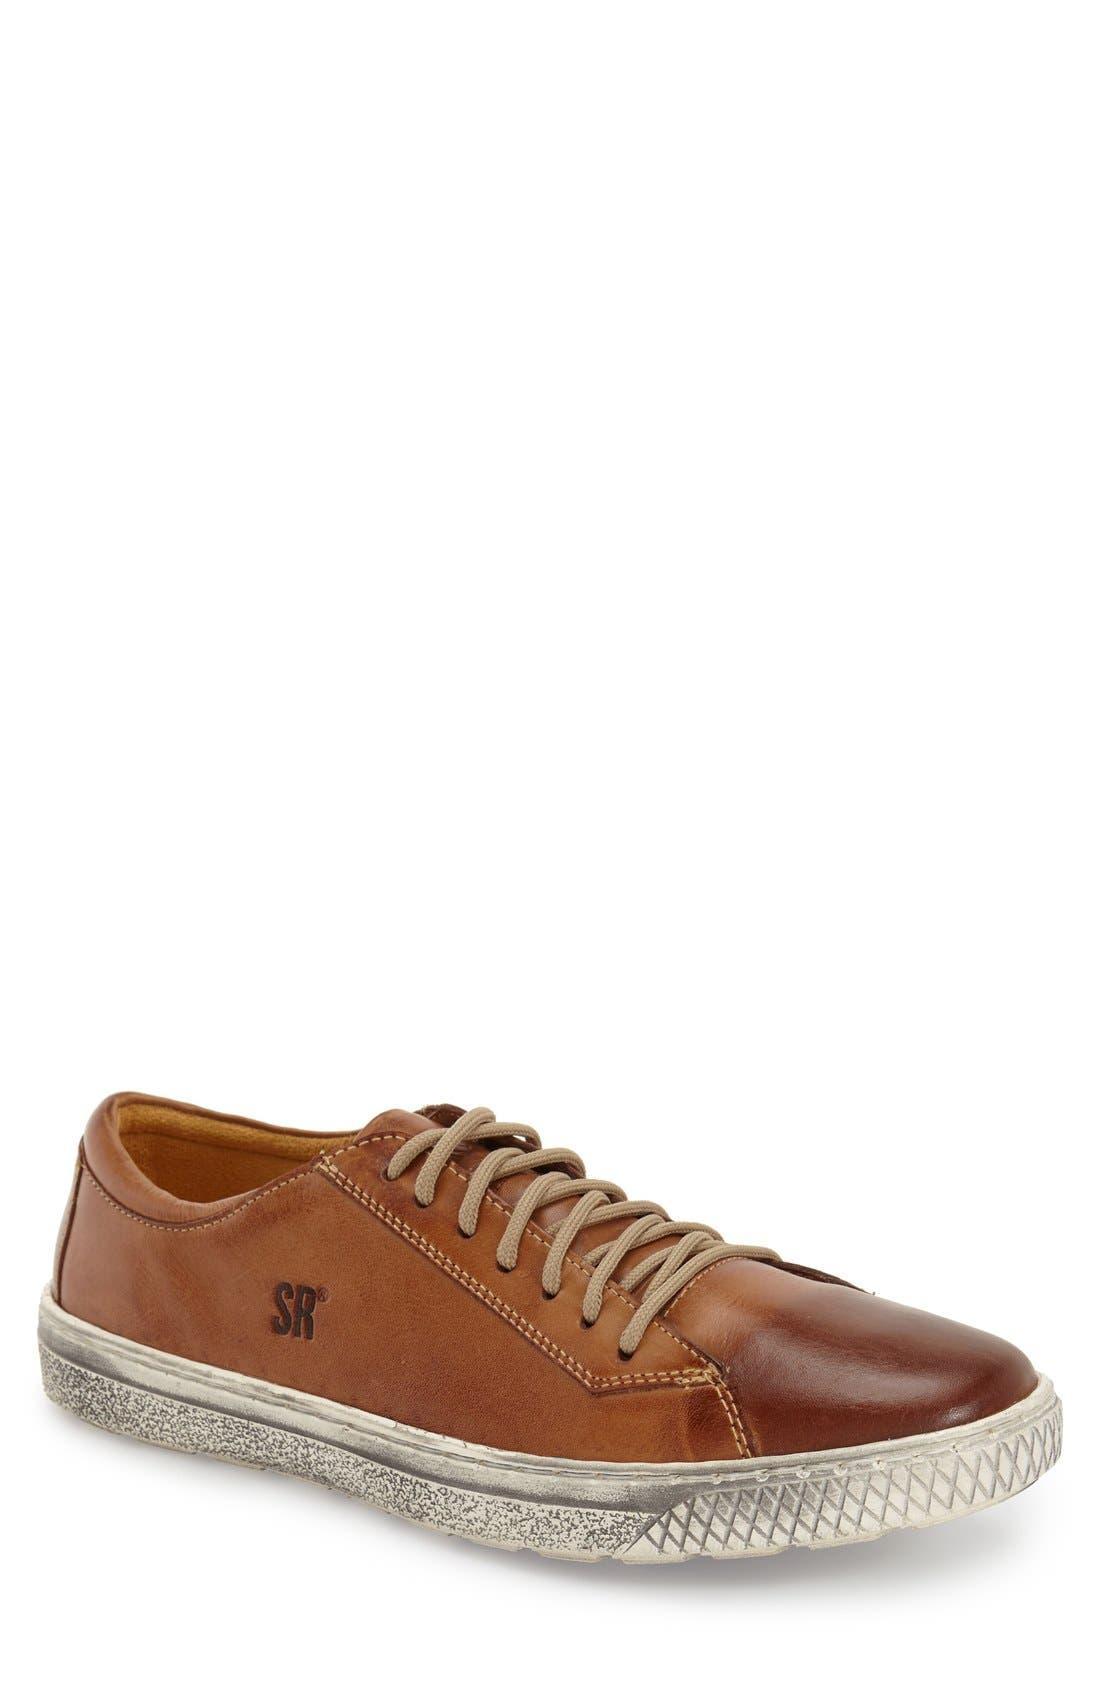 'Rolly' Sneaker,                         Main,                         color, Tan